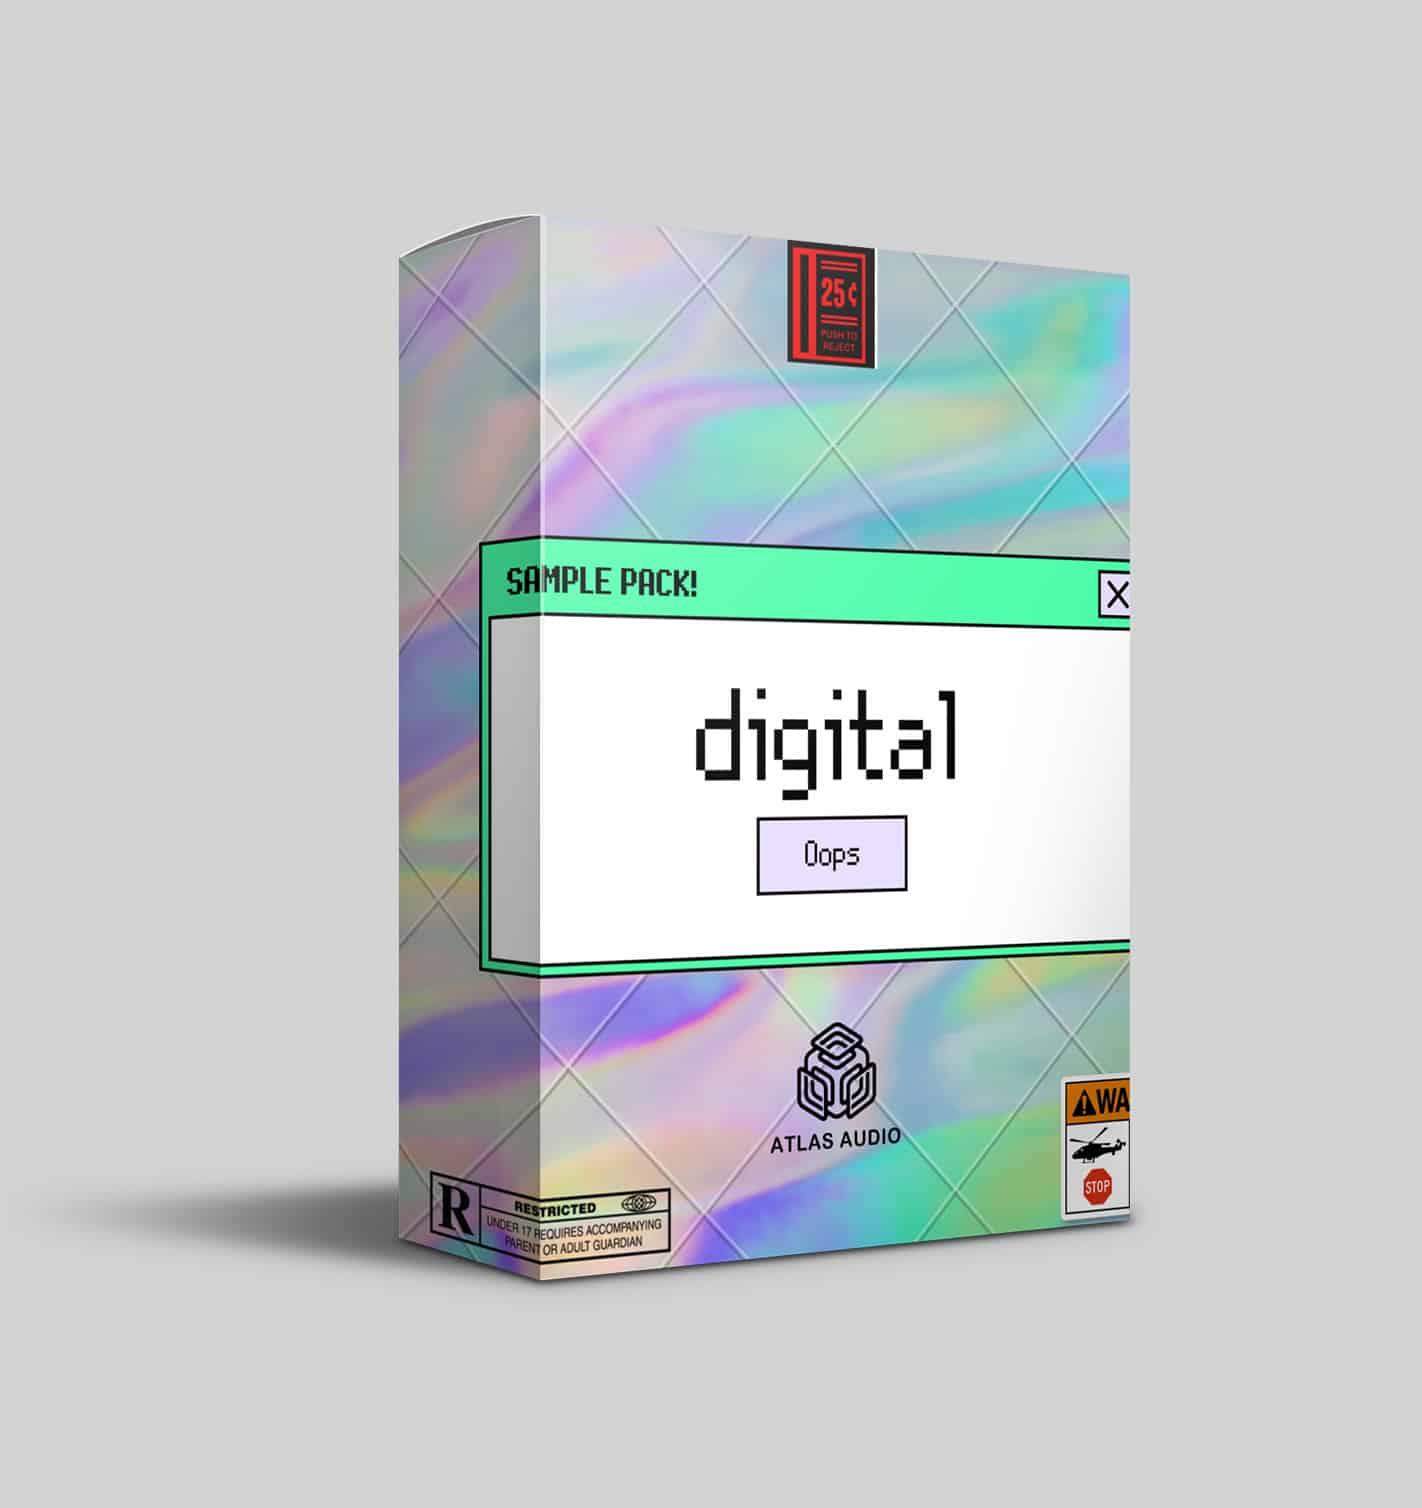 Atlas Audio - Digital Sample Pack